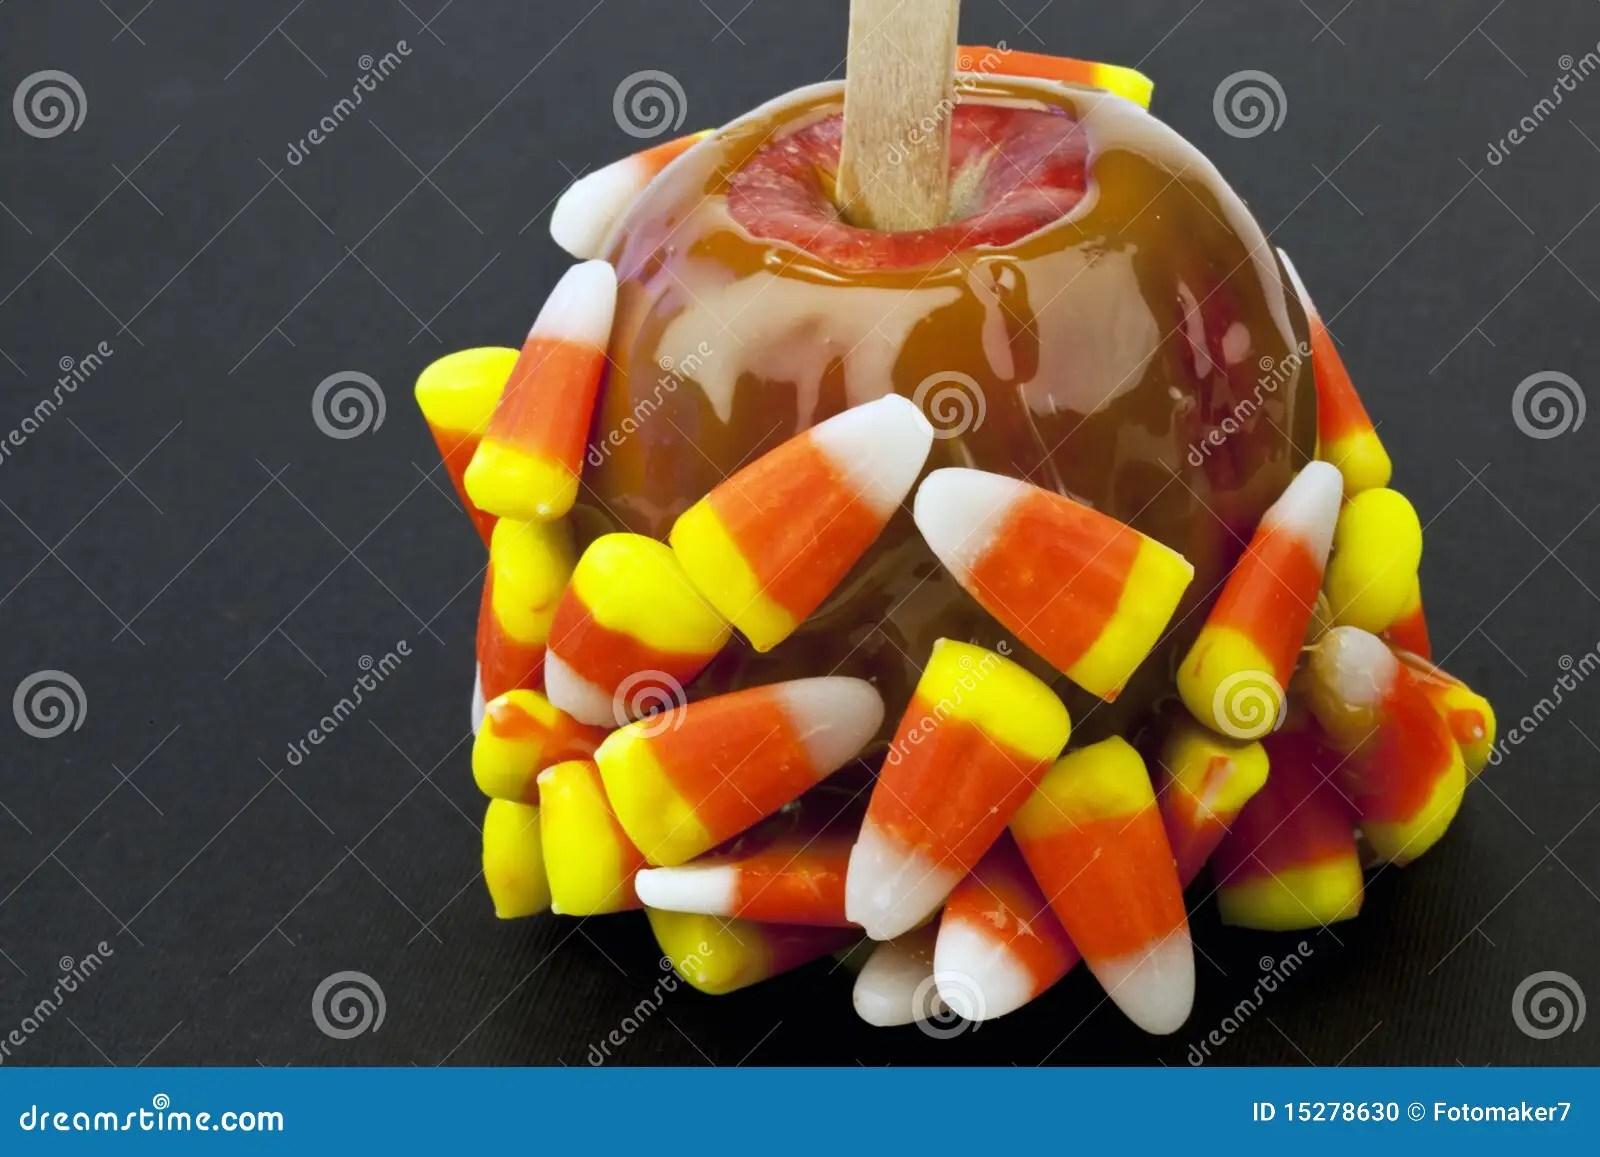 candy corn caramel apple